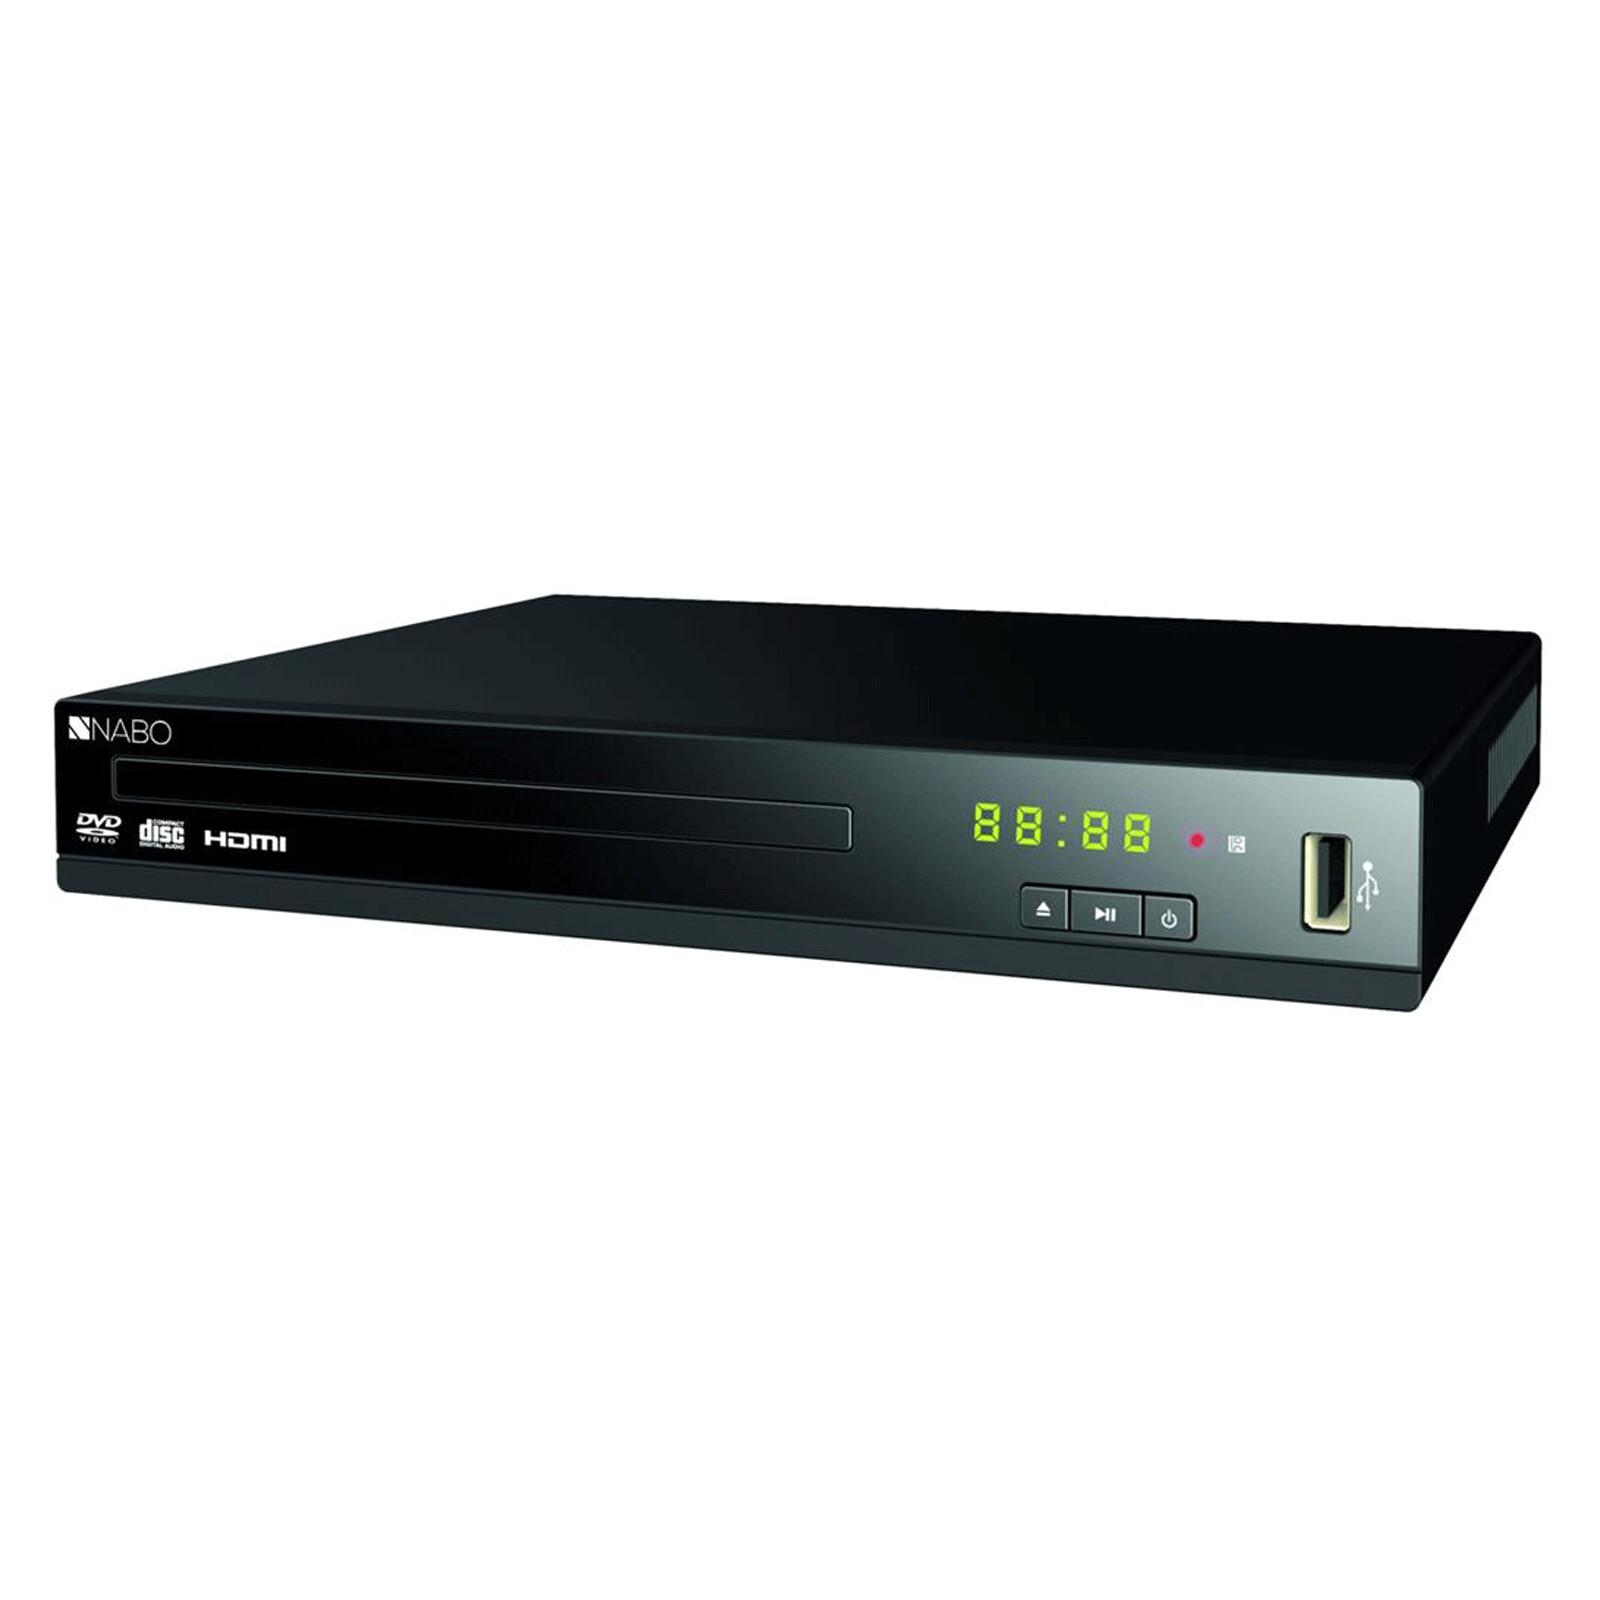 Nabo 2250 DVD Player